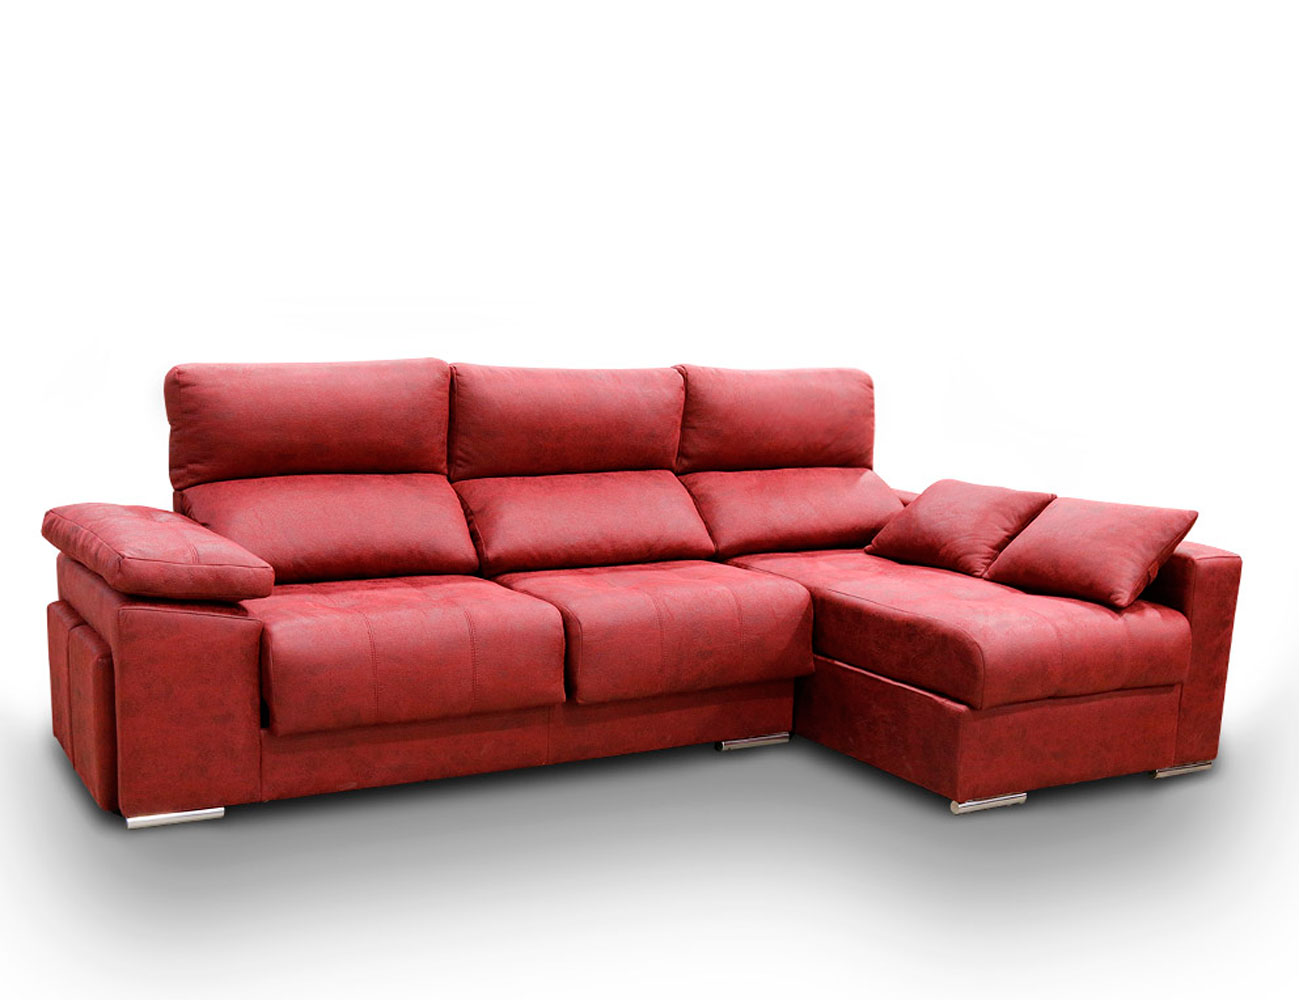 Sofa chaiselongue anti manchas rojo granate11